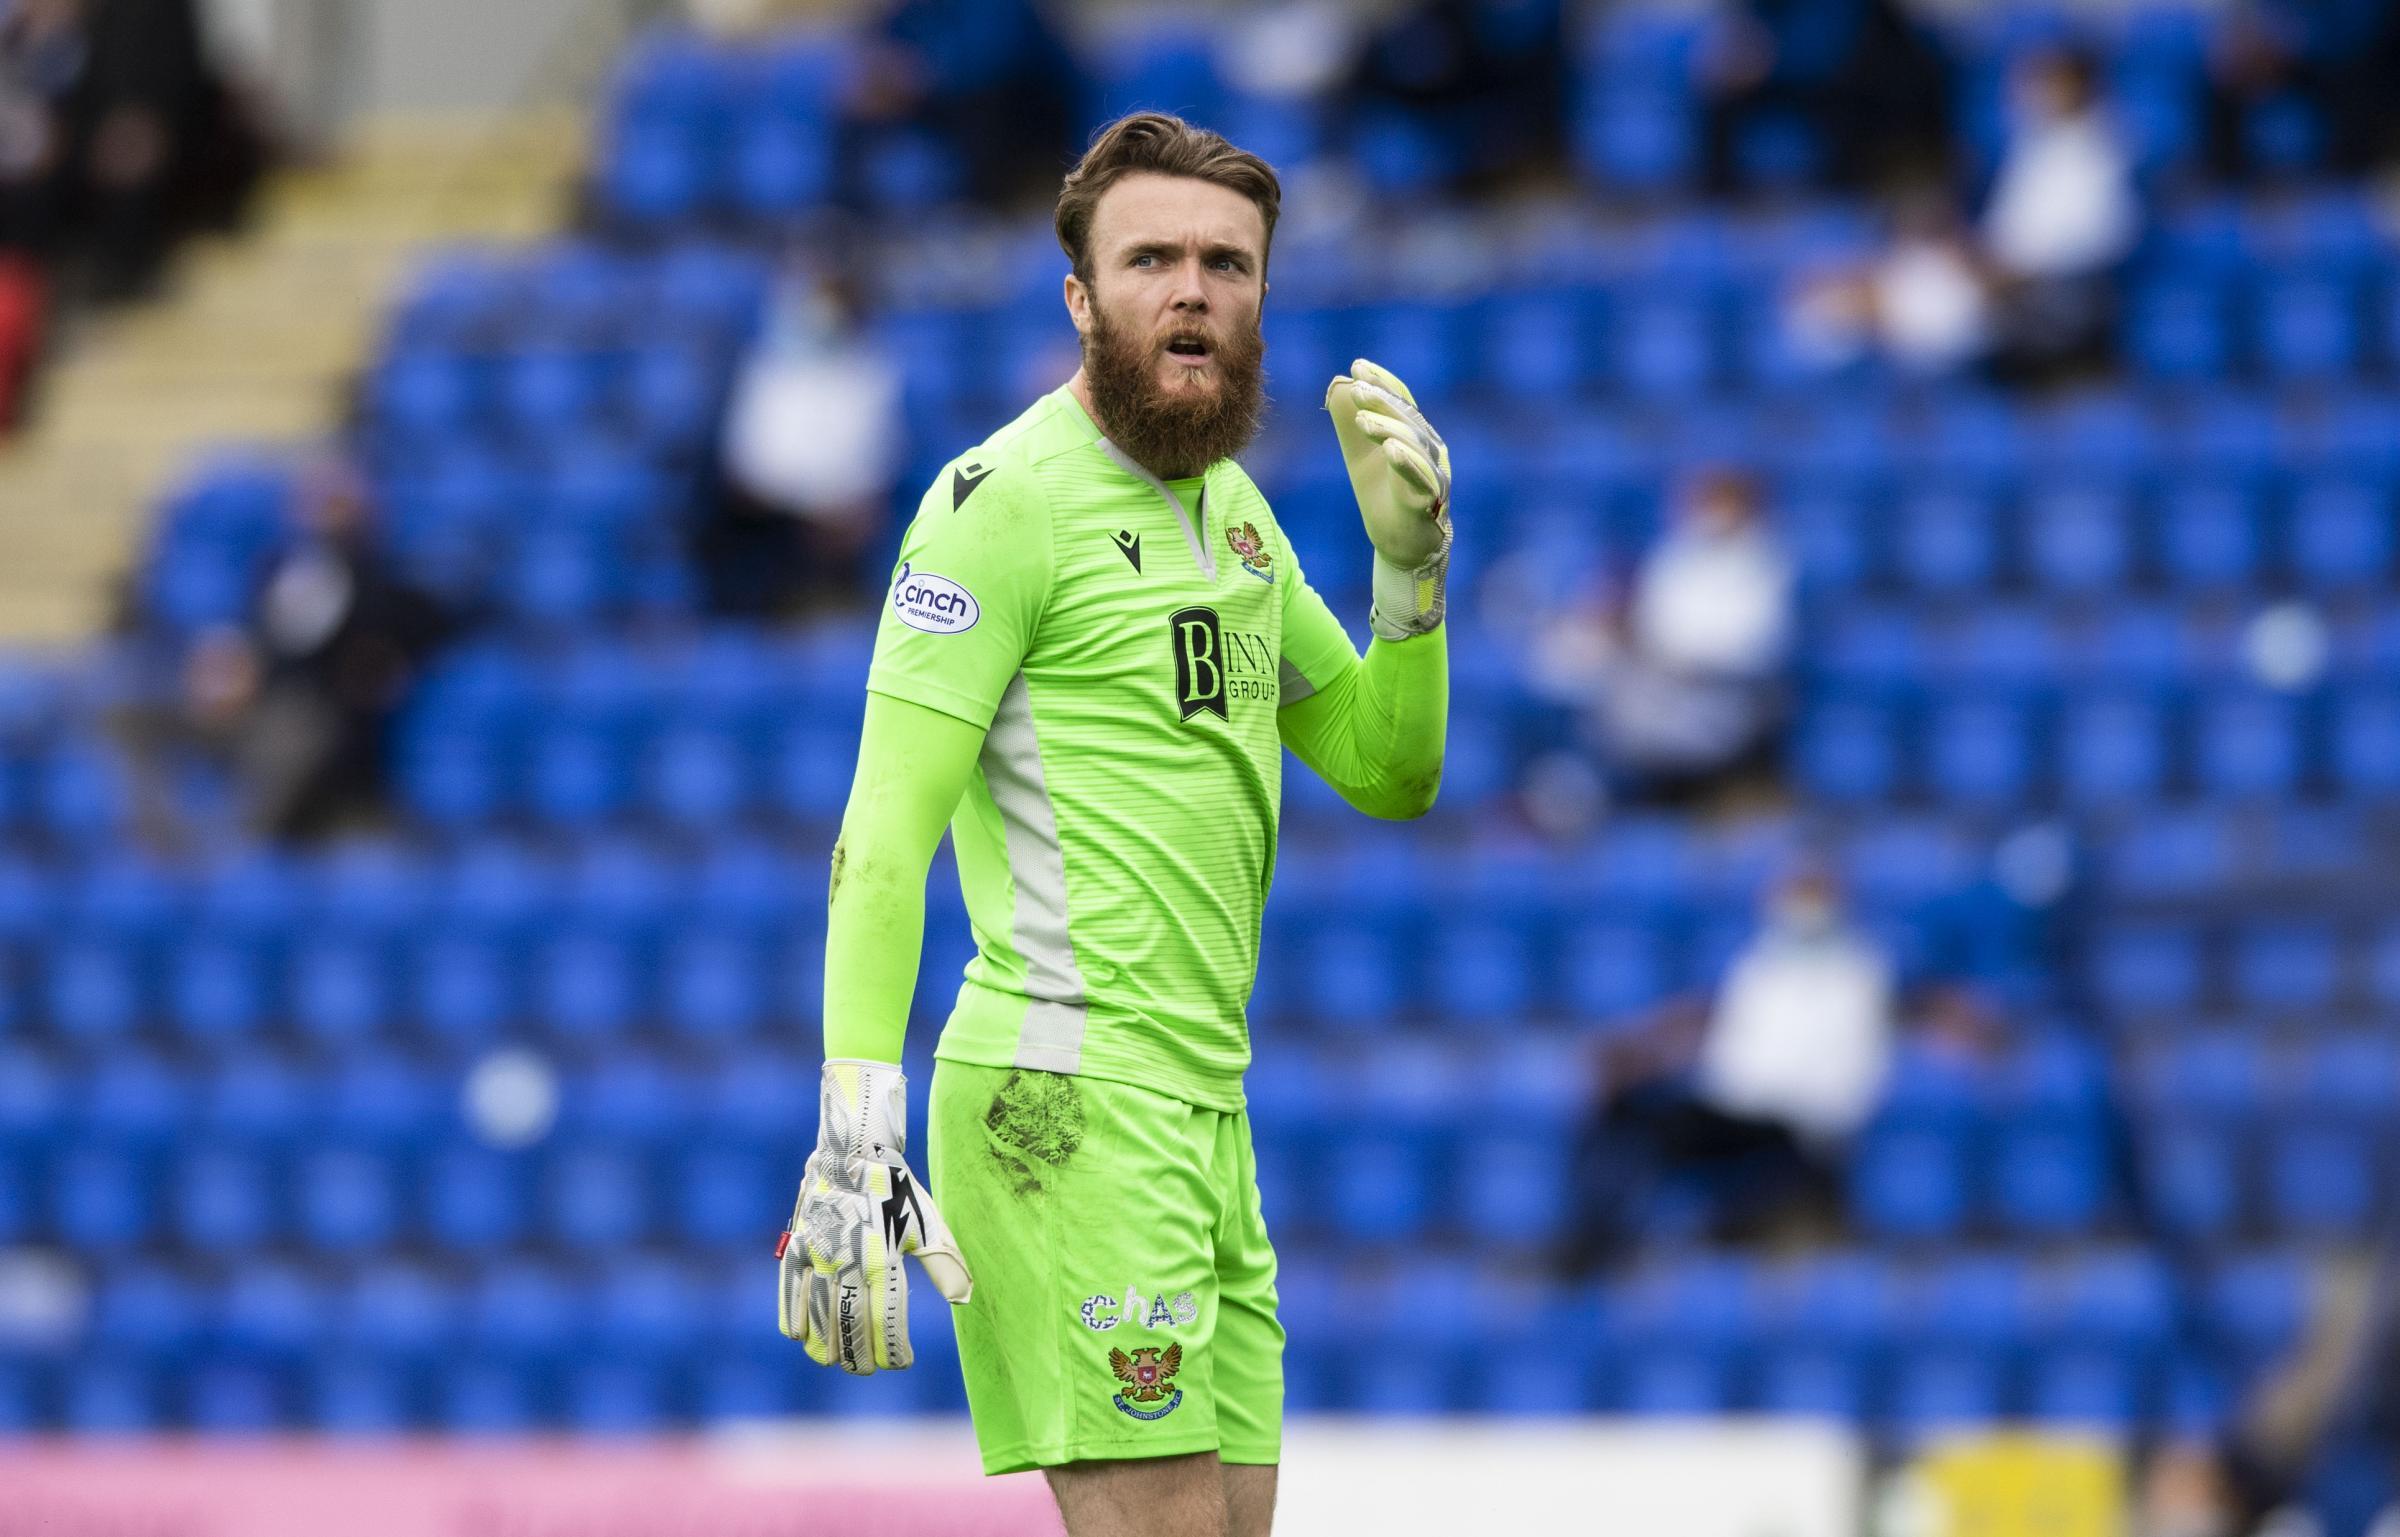 St Johnstone goalkeeper Zander Clark will have 'without doubt' caught the eye of Steve Clarke, says Callum Davidson